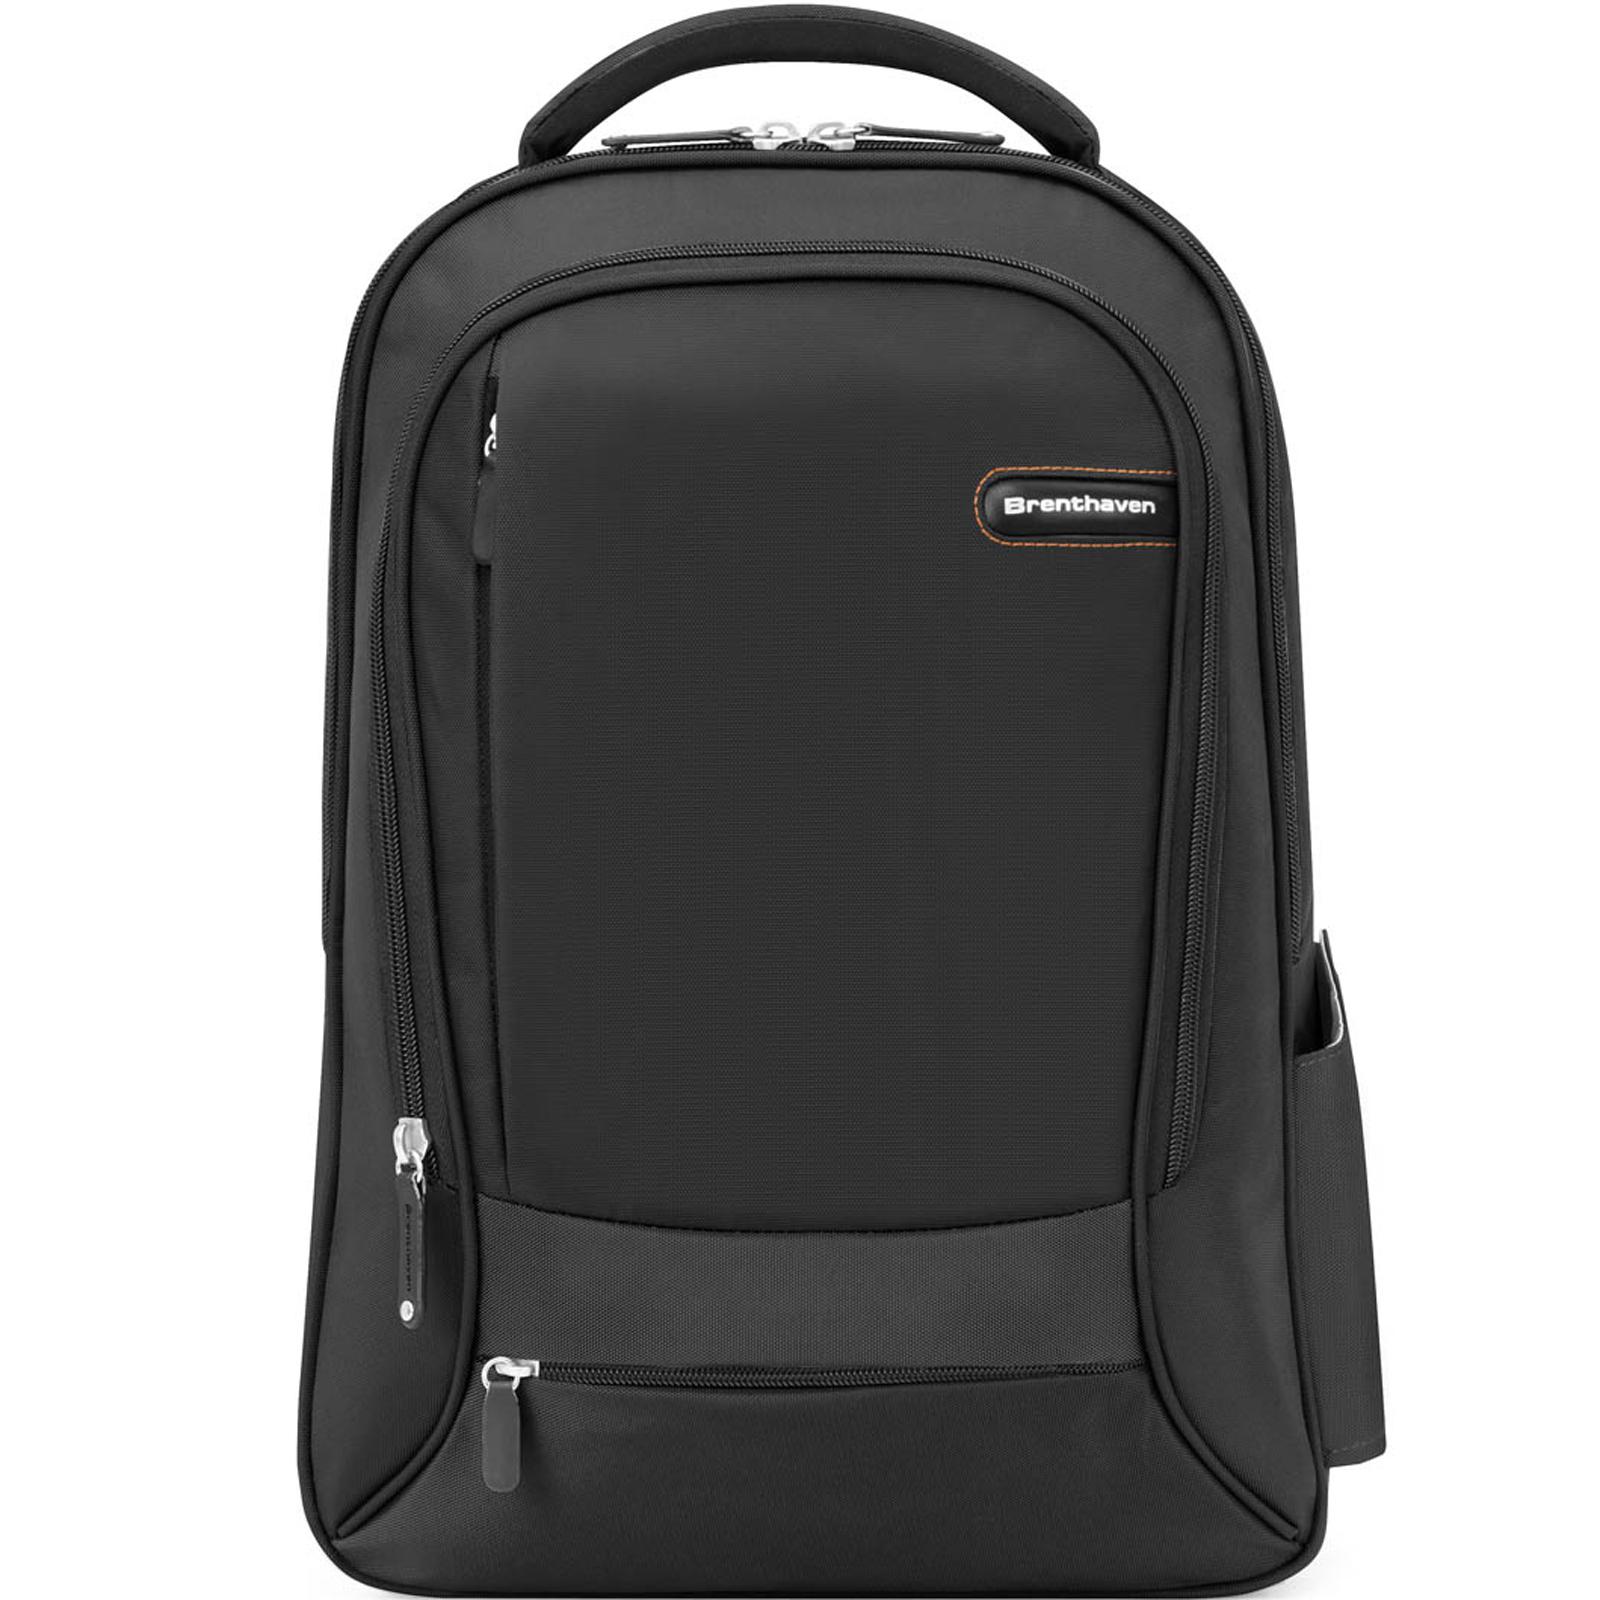 Amazon.com: BACKPACK de BRENTHAVEN modelo PROSTYLE LITE color Black: Health & Personal Care